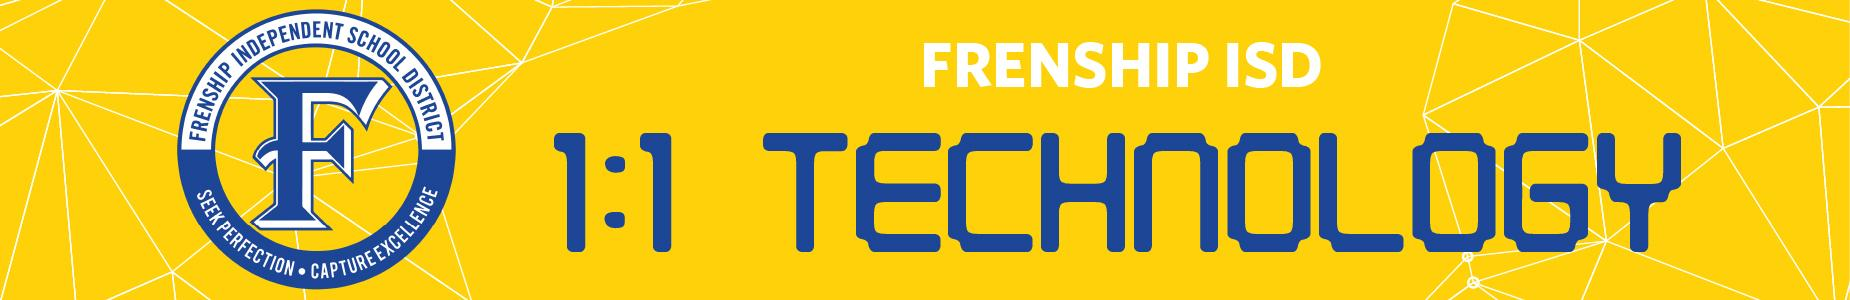 Frenship ISD 1:1 Technology